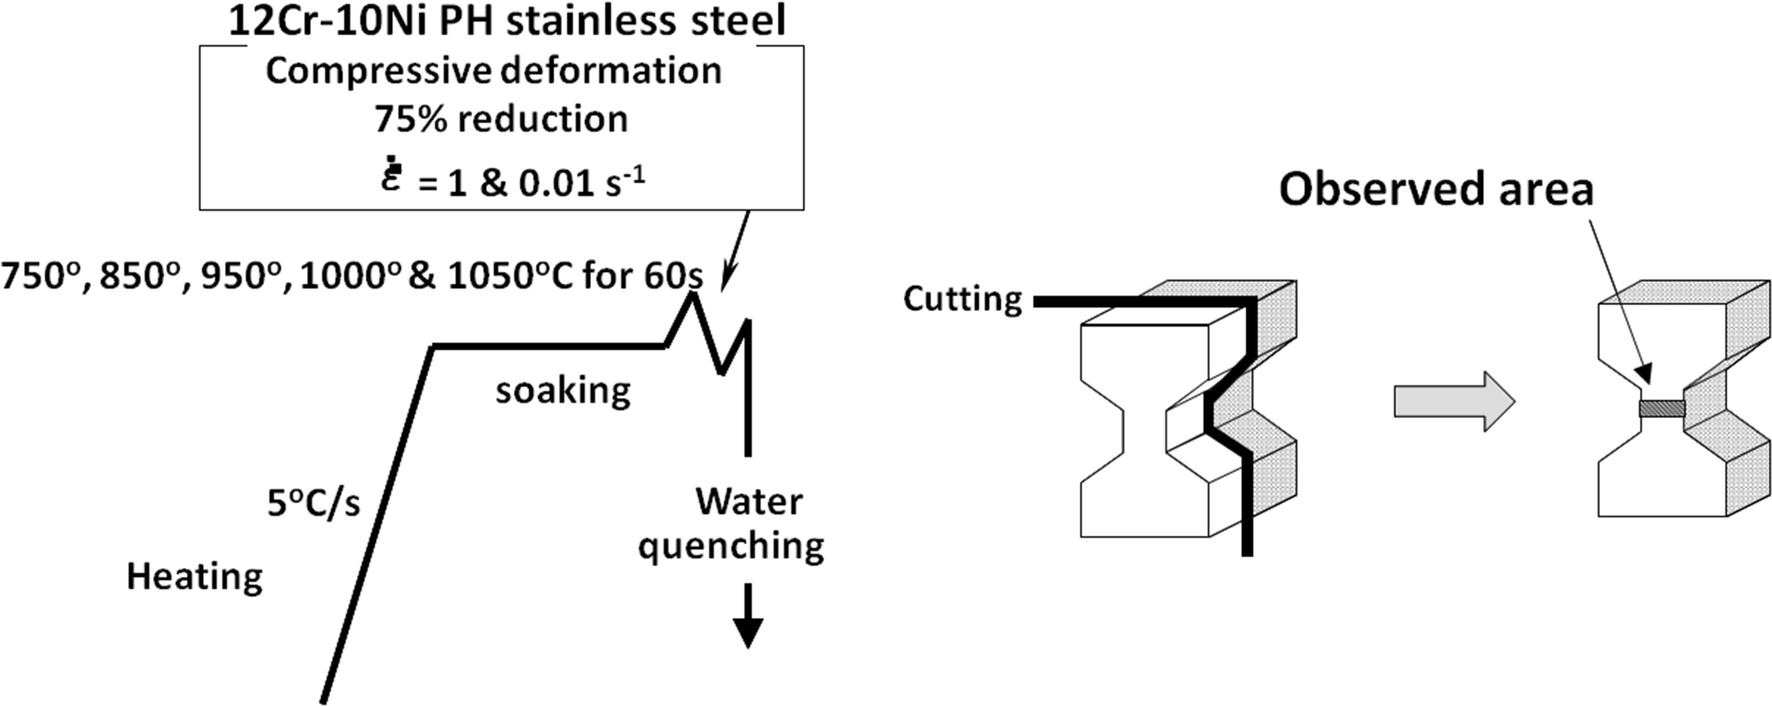 Effect Of Zenerholloman Parameter On The Prior Austenite Grain Size 850 Gas Furnace Schematic Fig 1